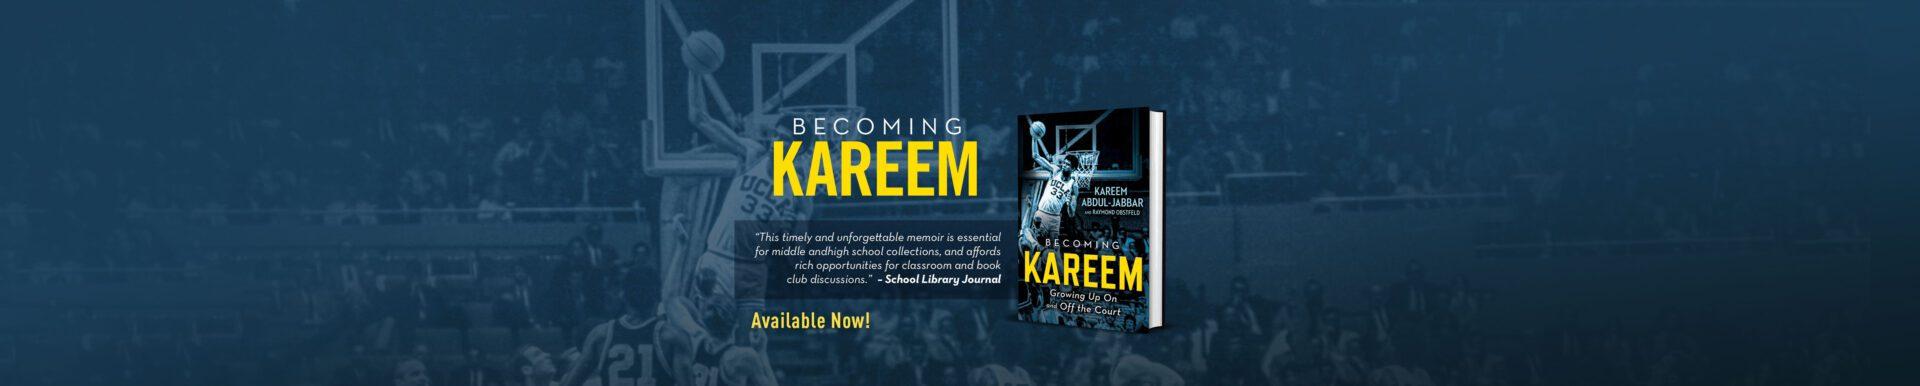 kaj_becoming-kareem_site-header_1a